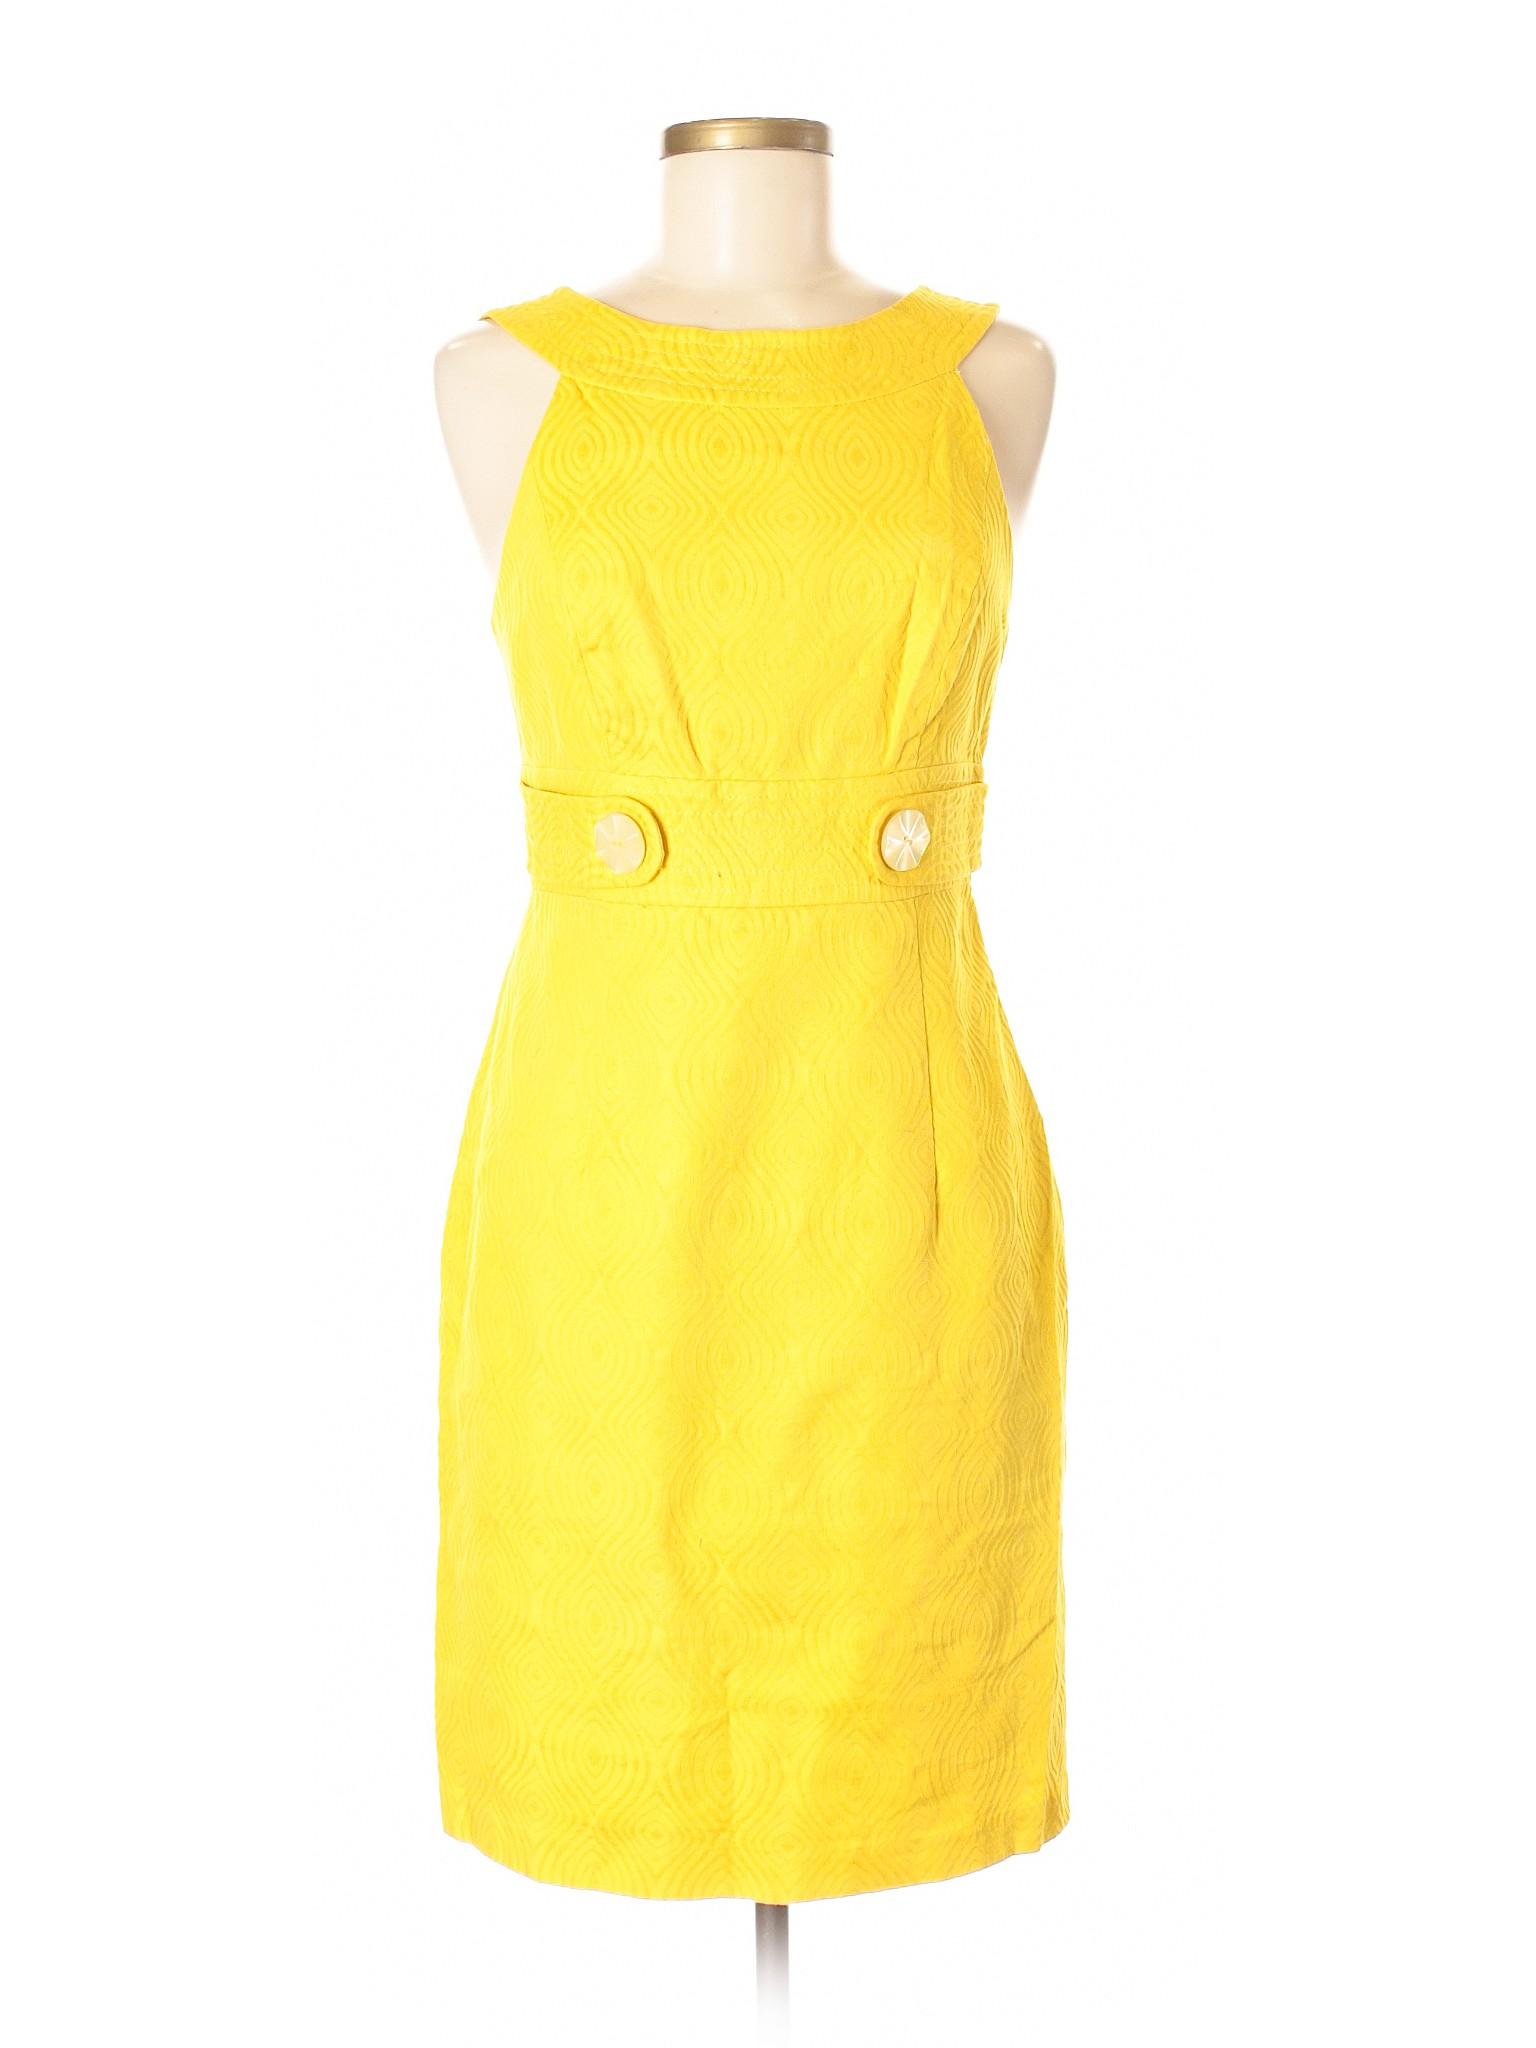 winter winter winter Casual Dress Boutique Casual Madison Boutique Madison Boutique Casual Madison Dress qz5w5EC